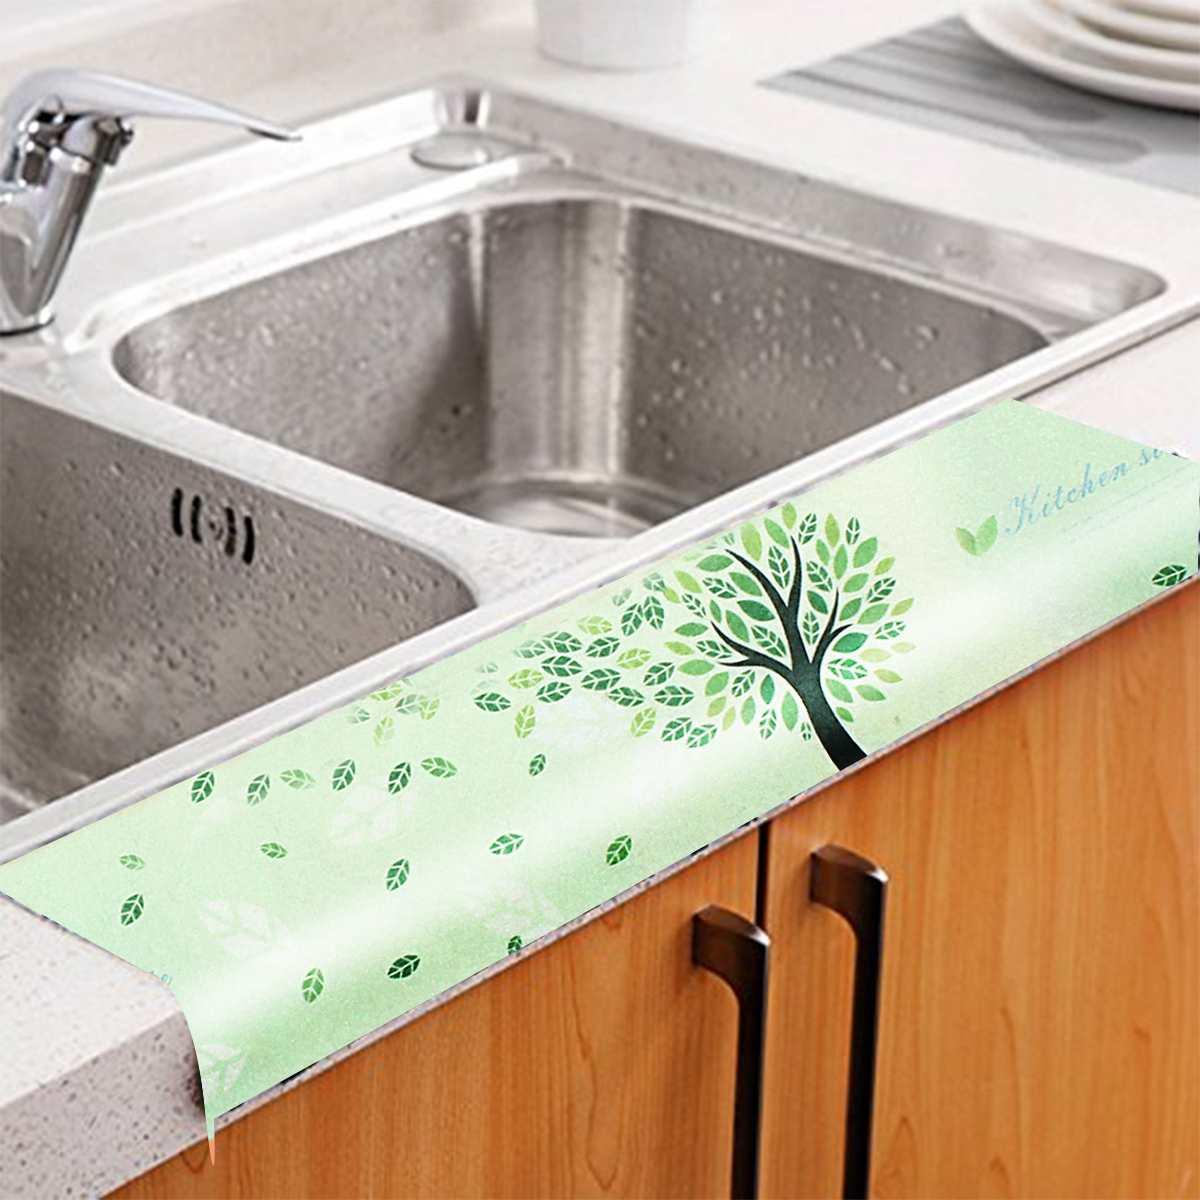 Bath Wall Sealing Strip Self Adhesive Kitchen Caulk Tape Waterproof Mildew Bath Sink Joint Crevice Sticker Corner Stick Strip